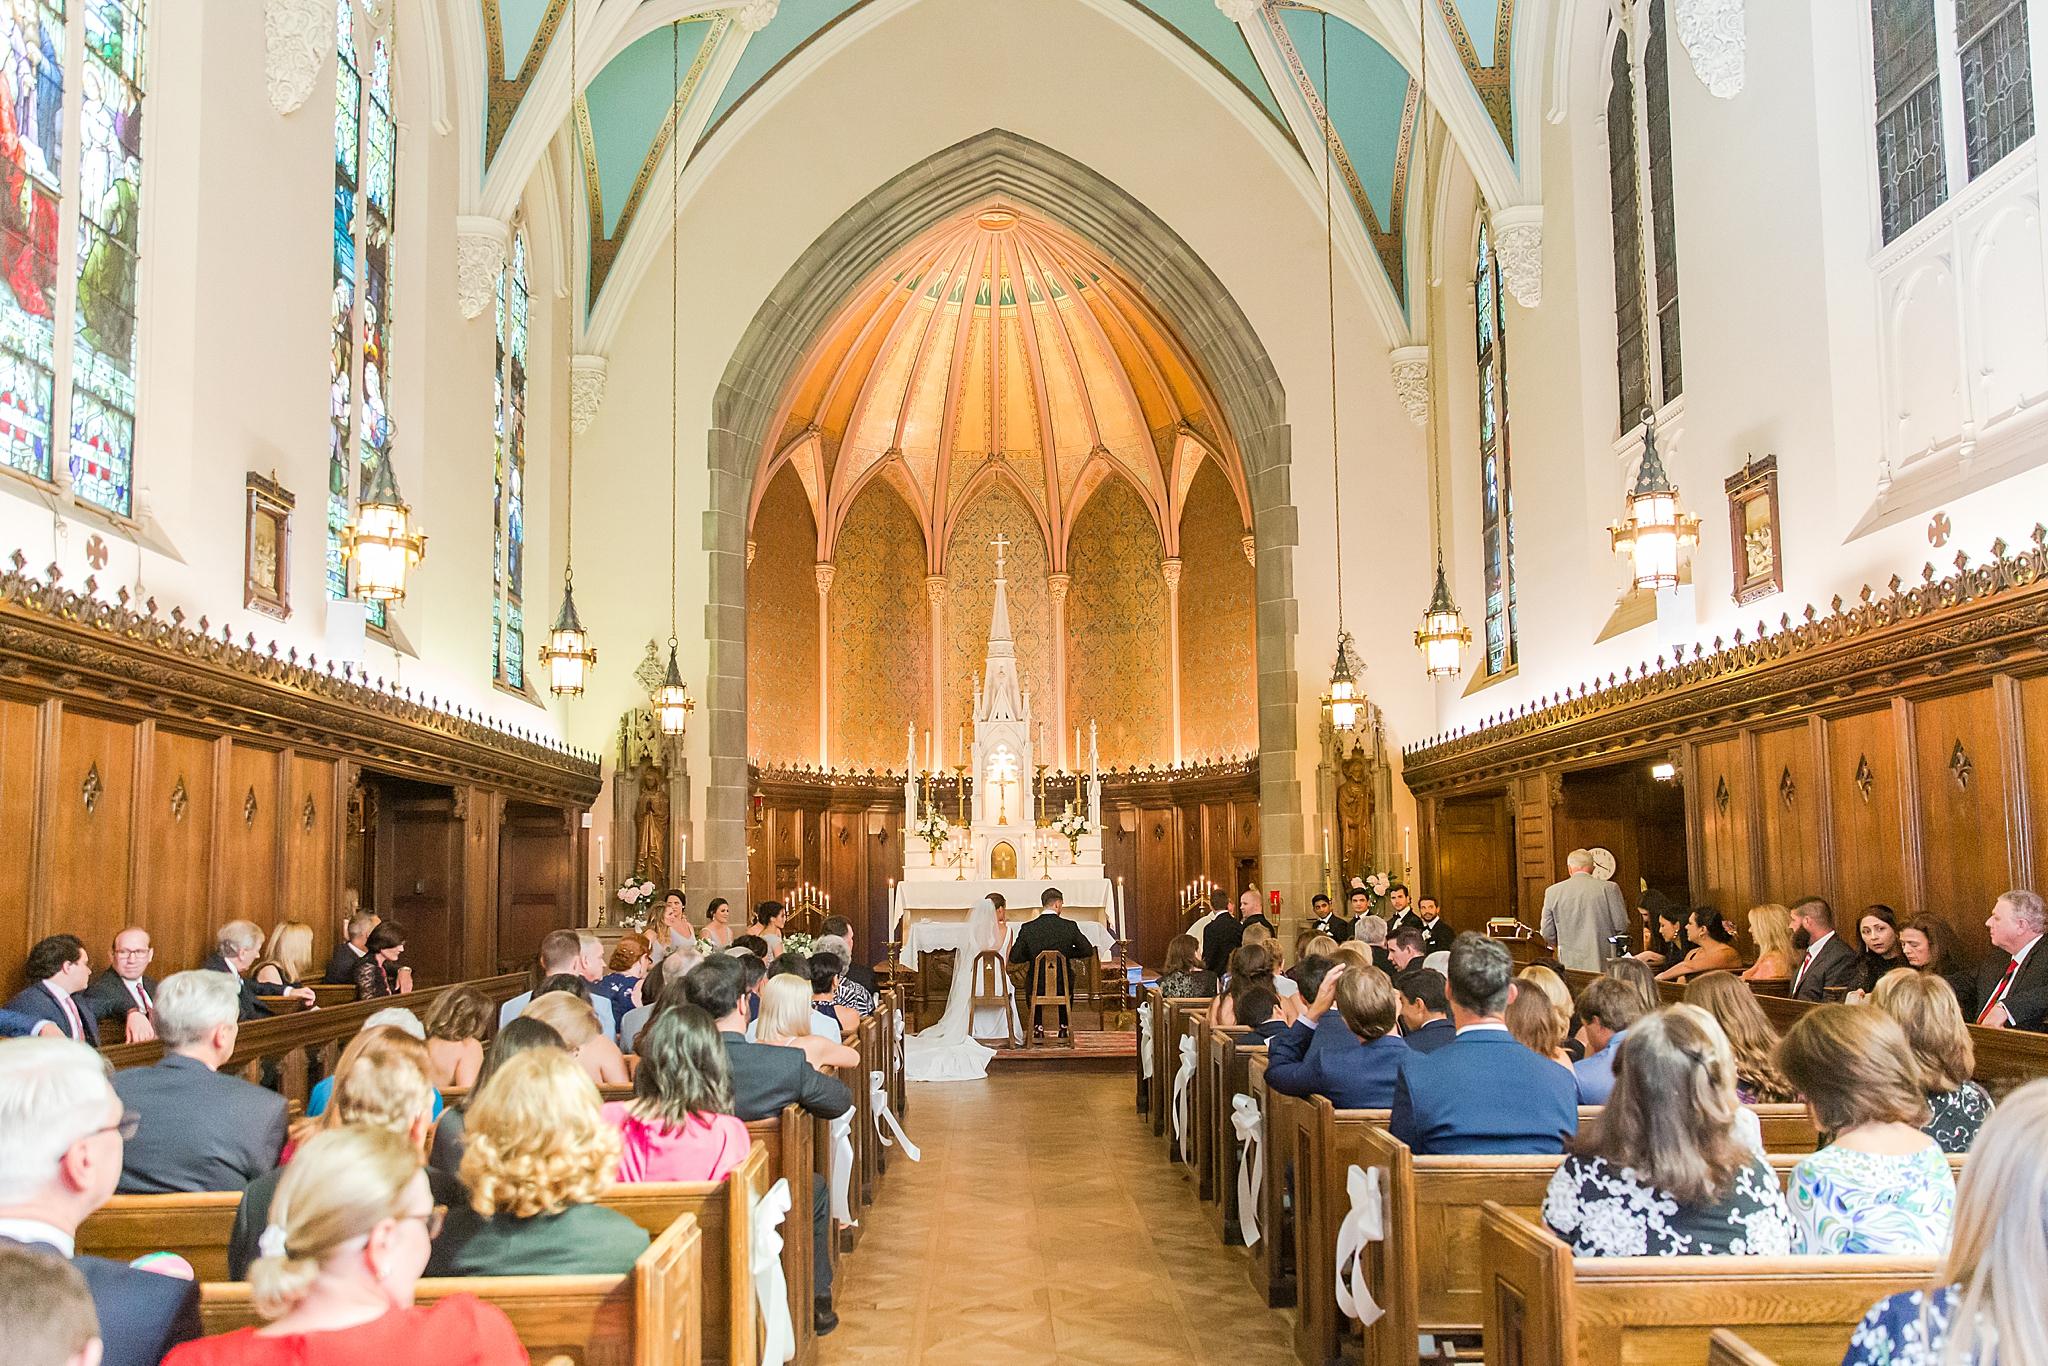 detroit-wedding-photographer-grosse-pointe-academy-chapel-detroit-golf-club-wedding-carly-matt-by-courtney-carolyn-photography_0038.jpg